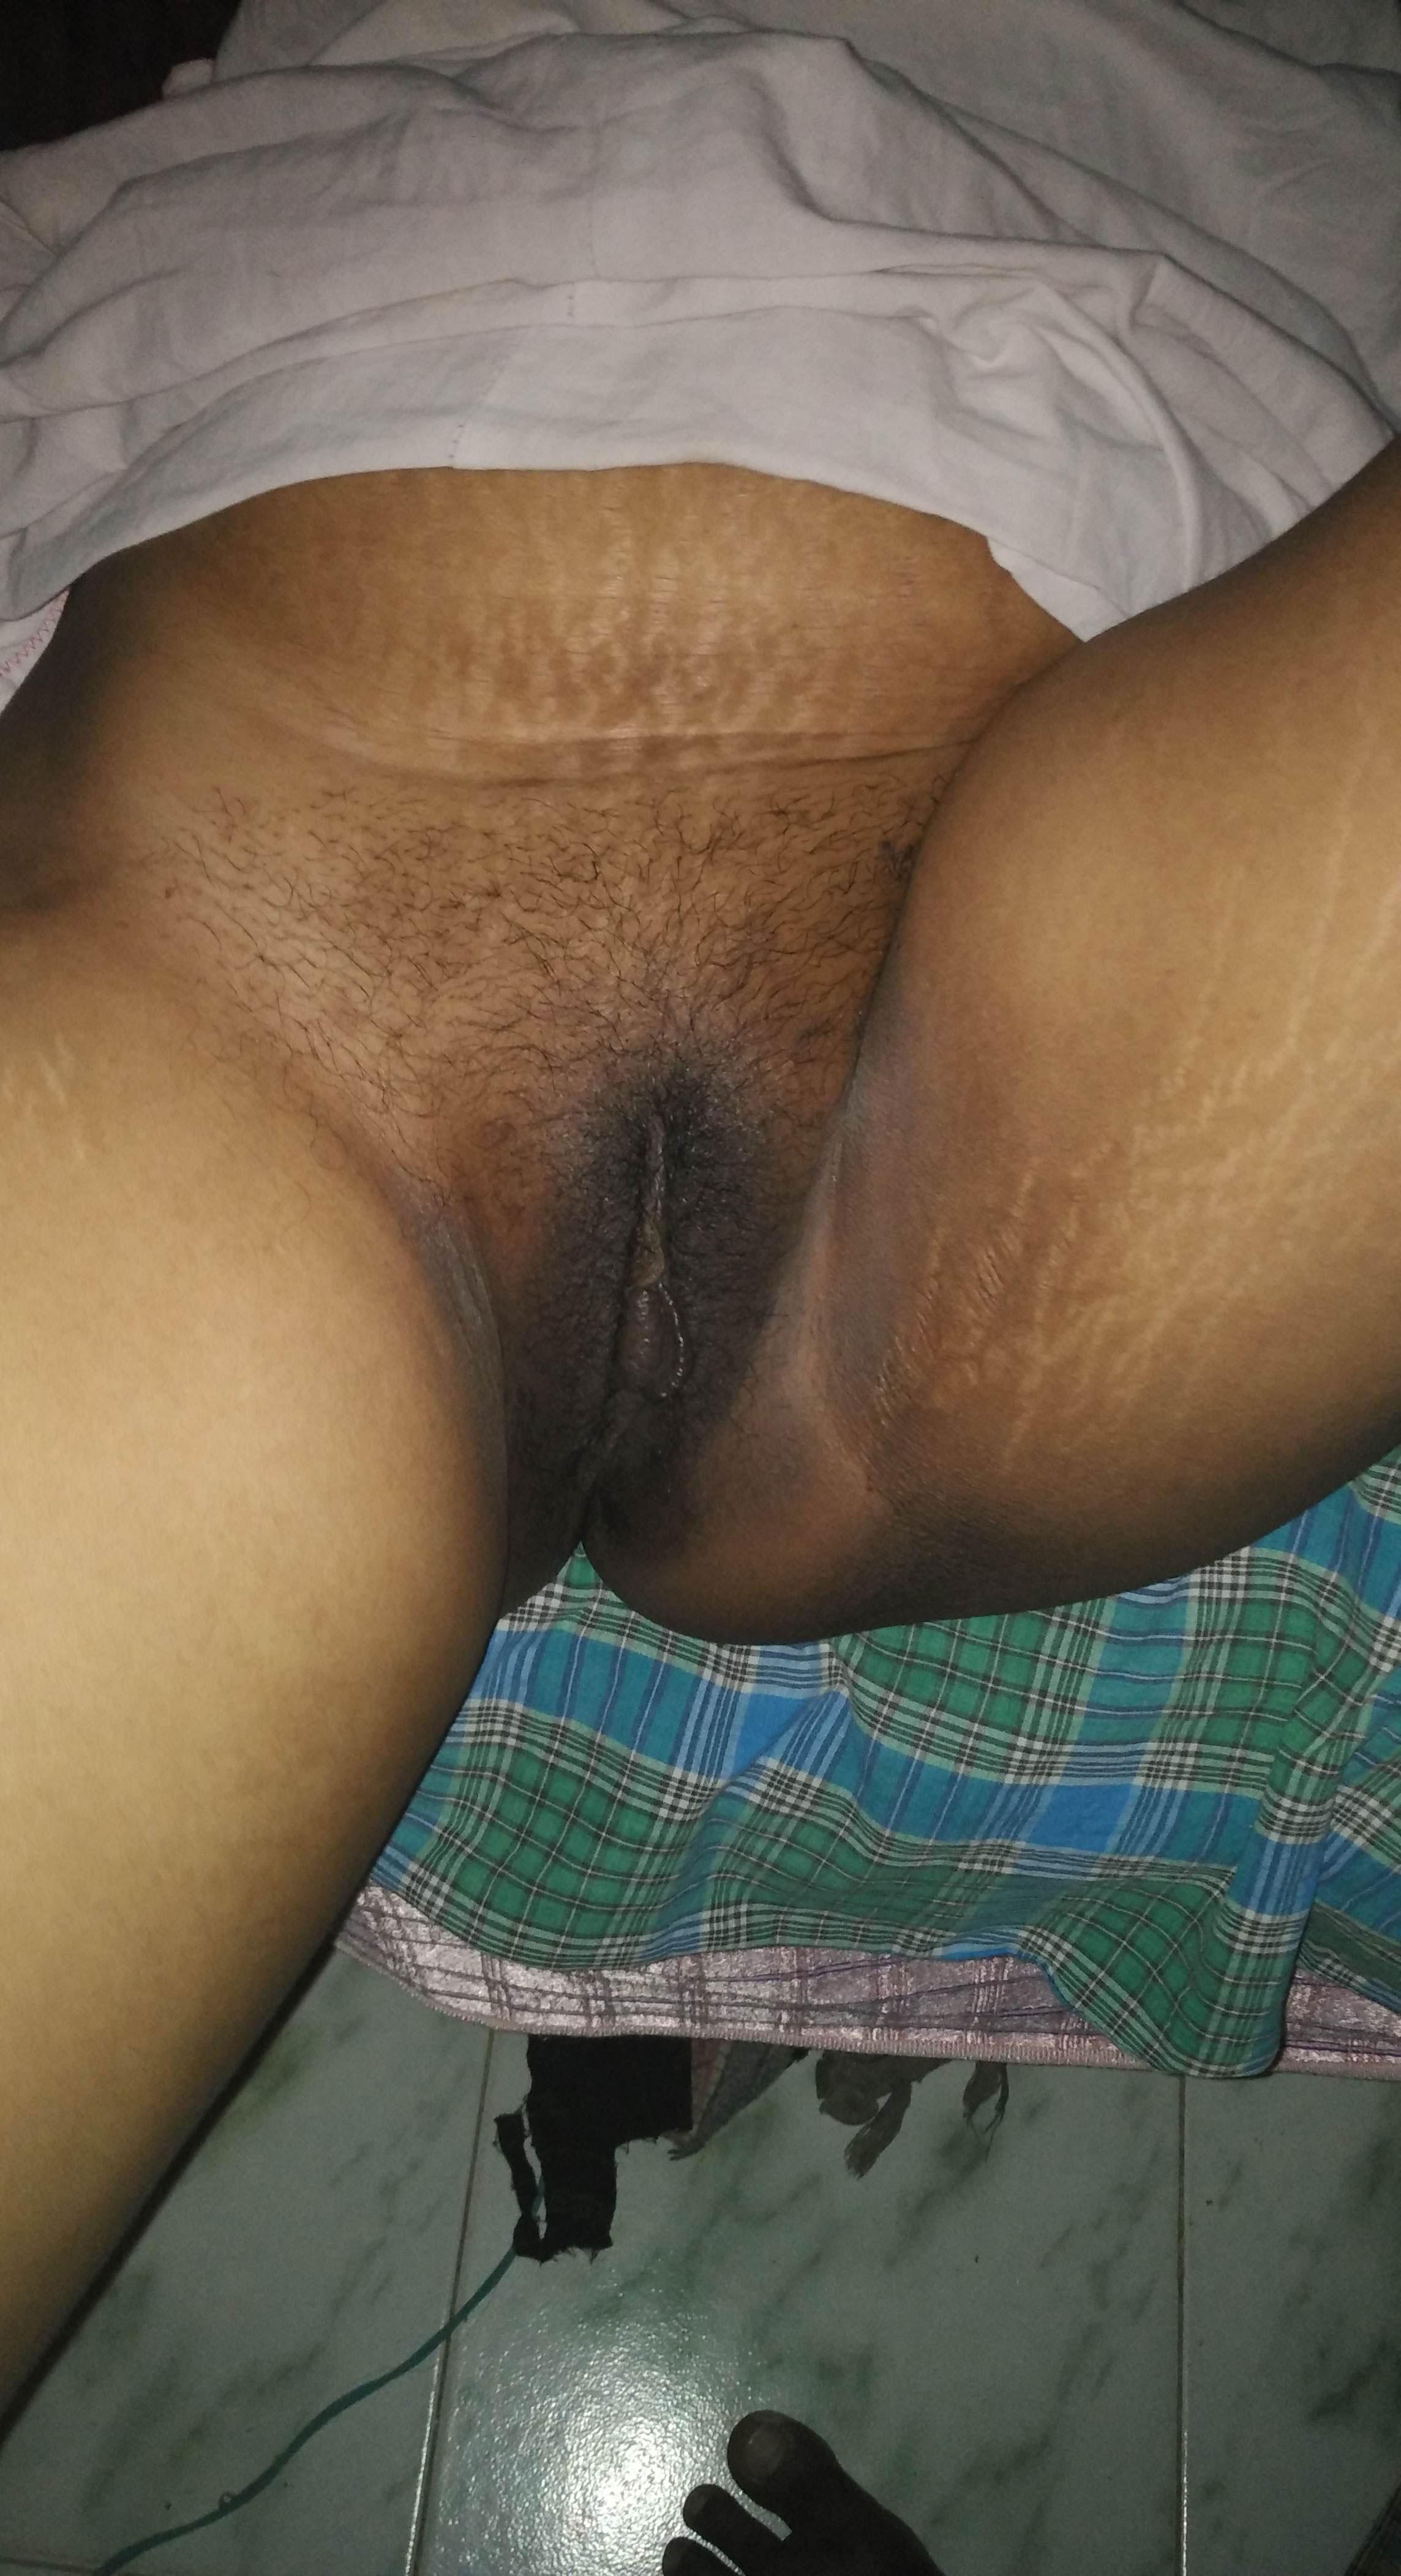 Horny Married Hotties Sexy Nude Pics Revealed Xxx Desi Photos-6807